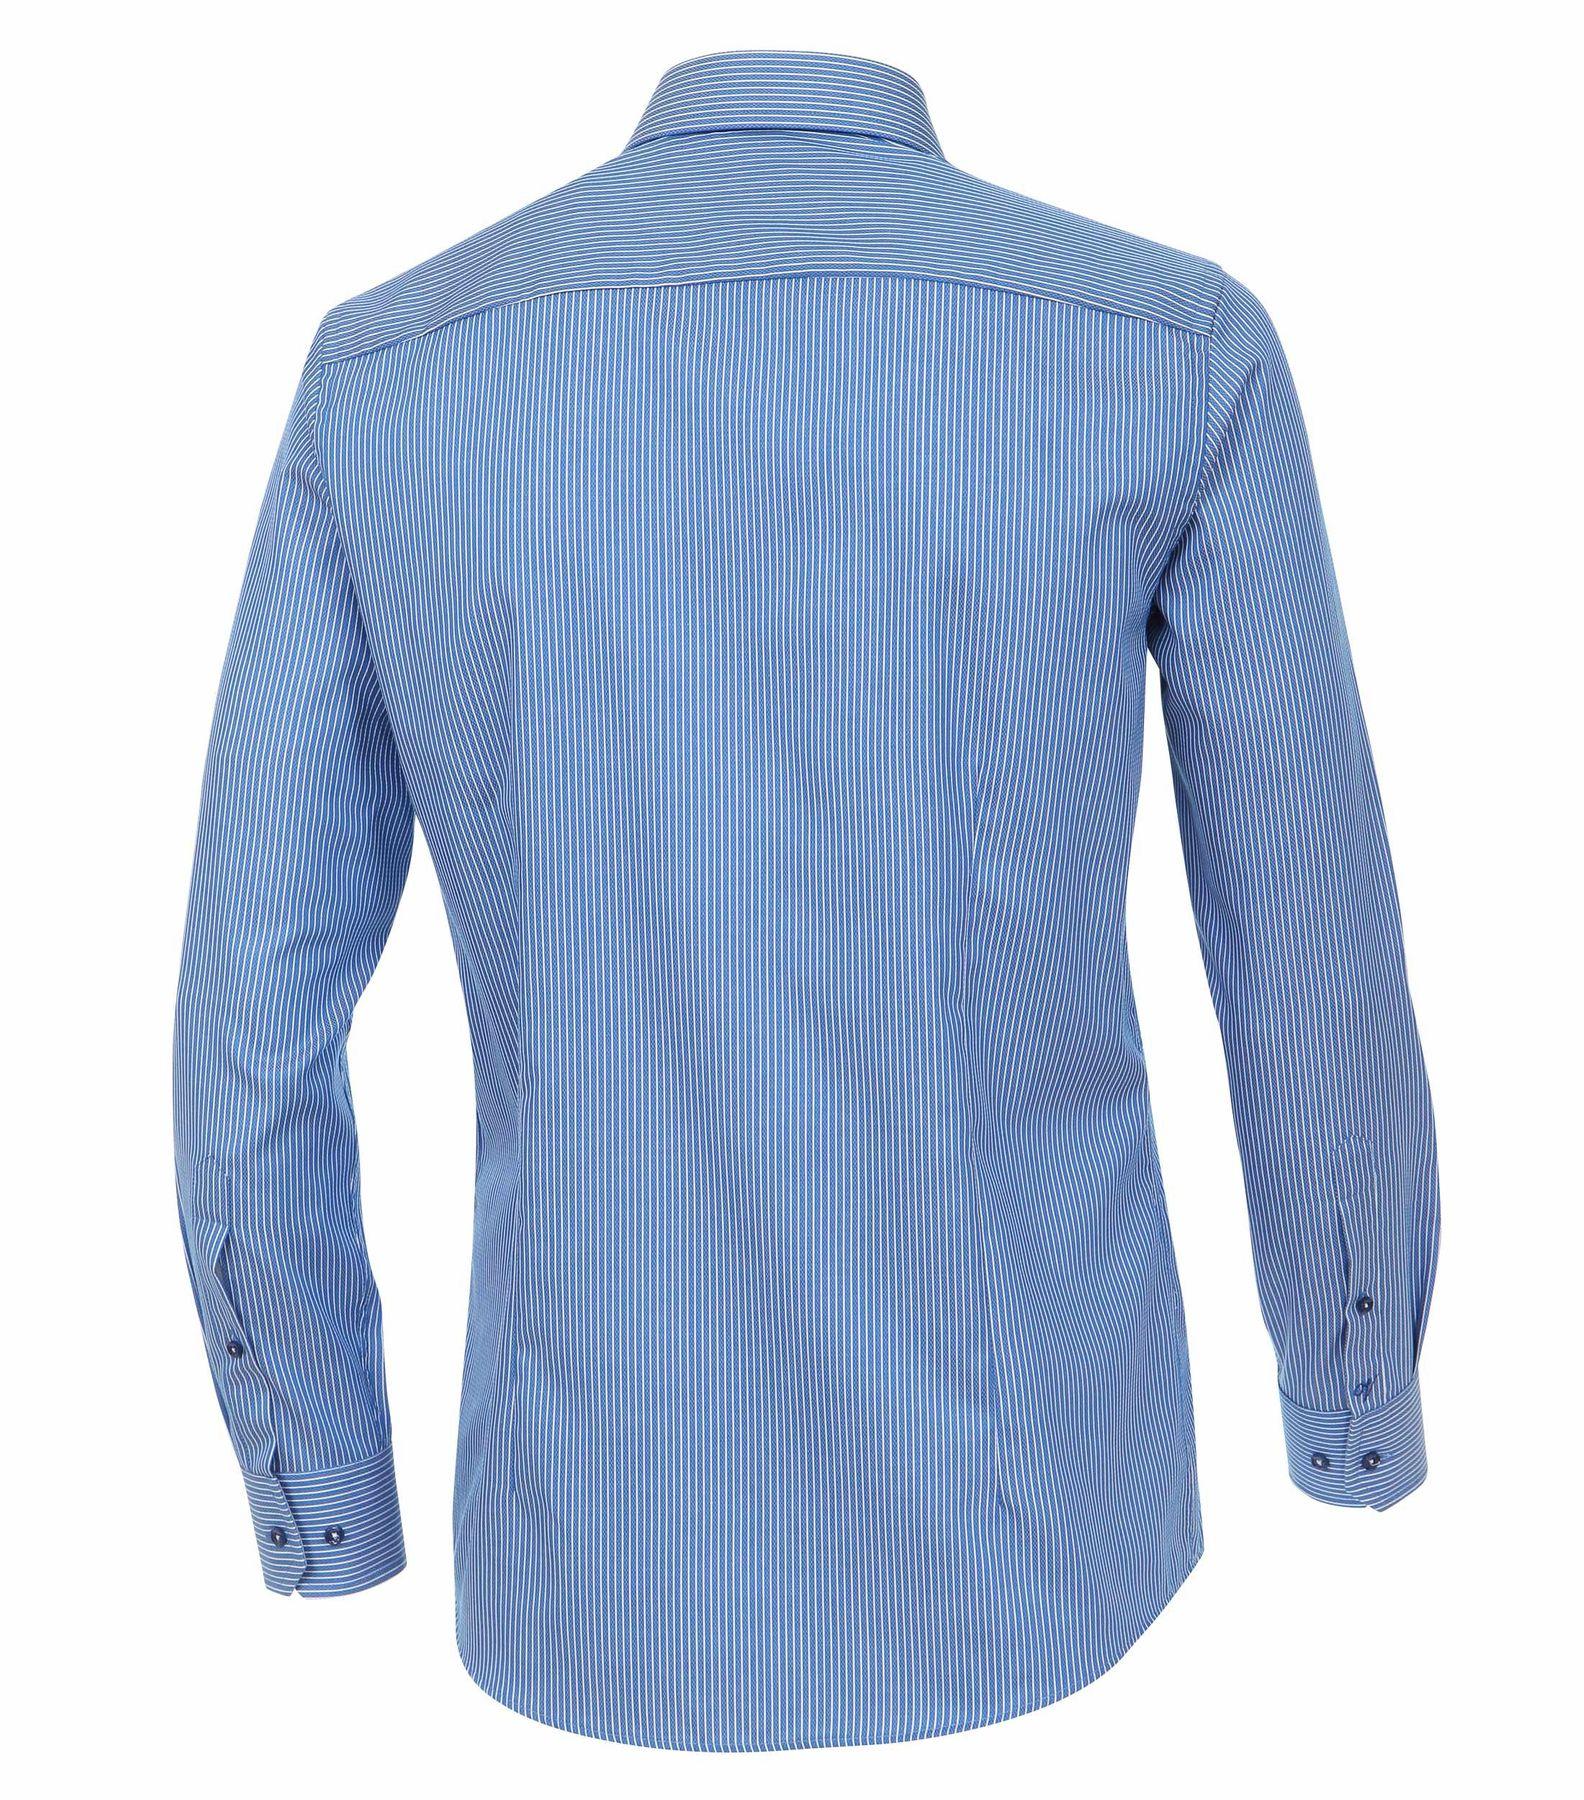 Venti - Slim Fit - Herren Langarm Hemd gestreift mit Kent Kragen (172678700) – Bild 6